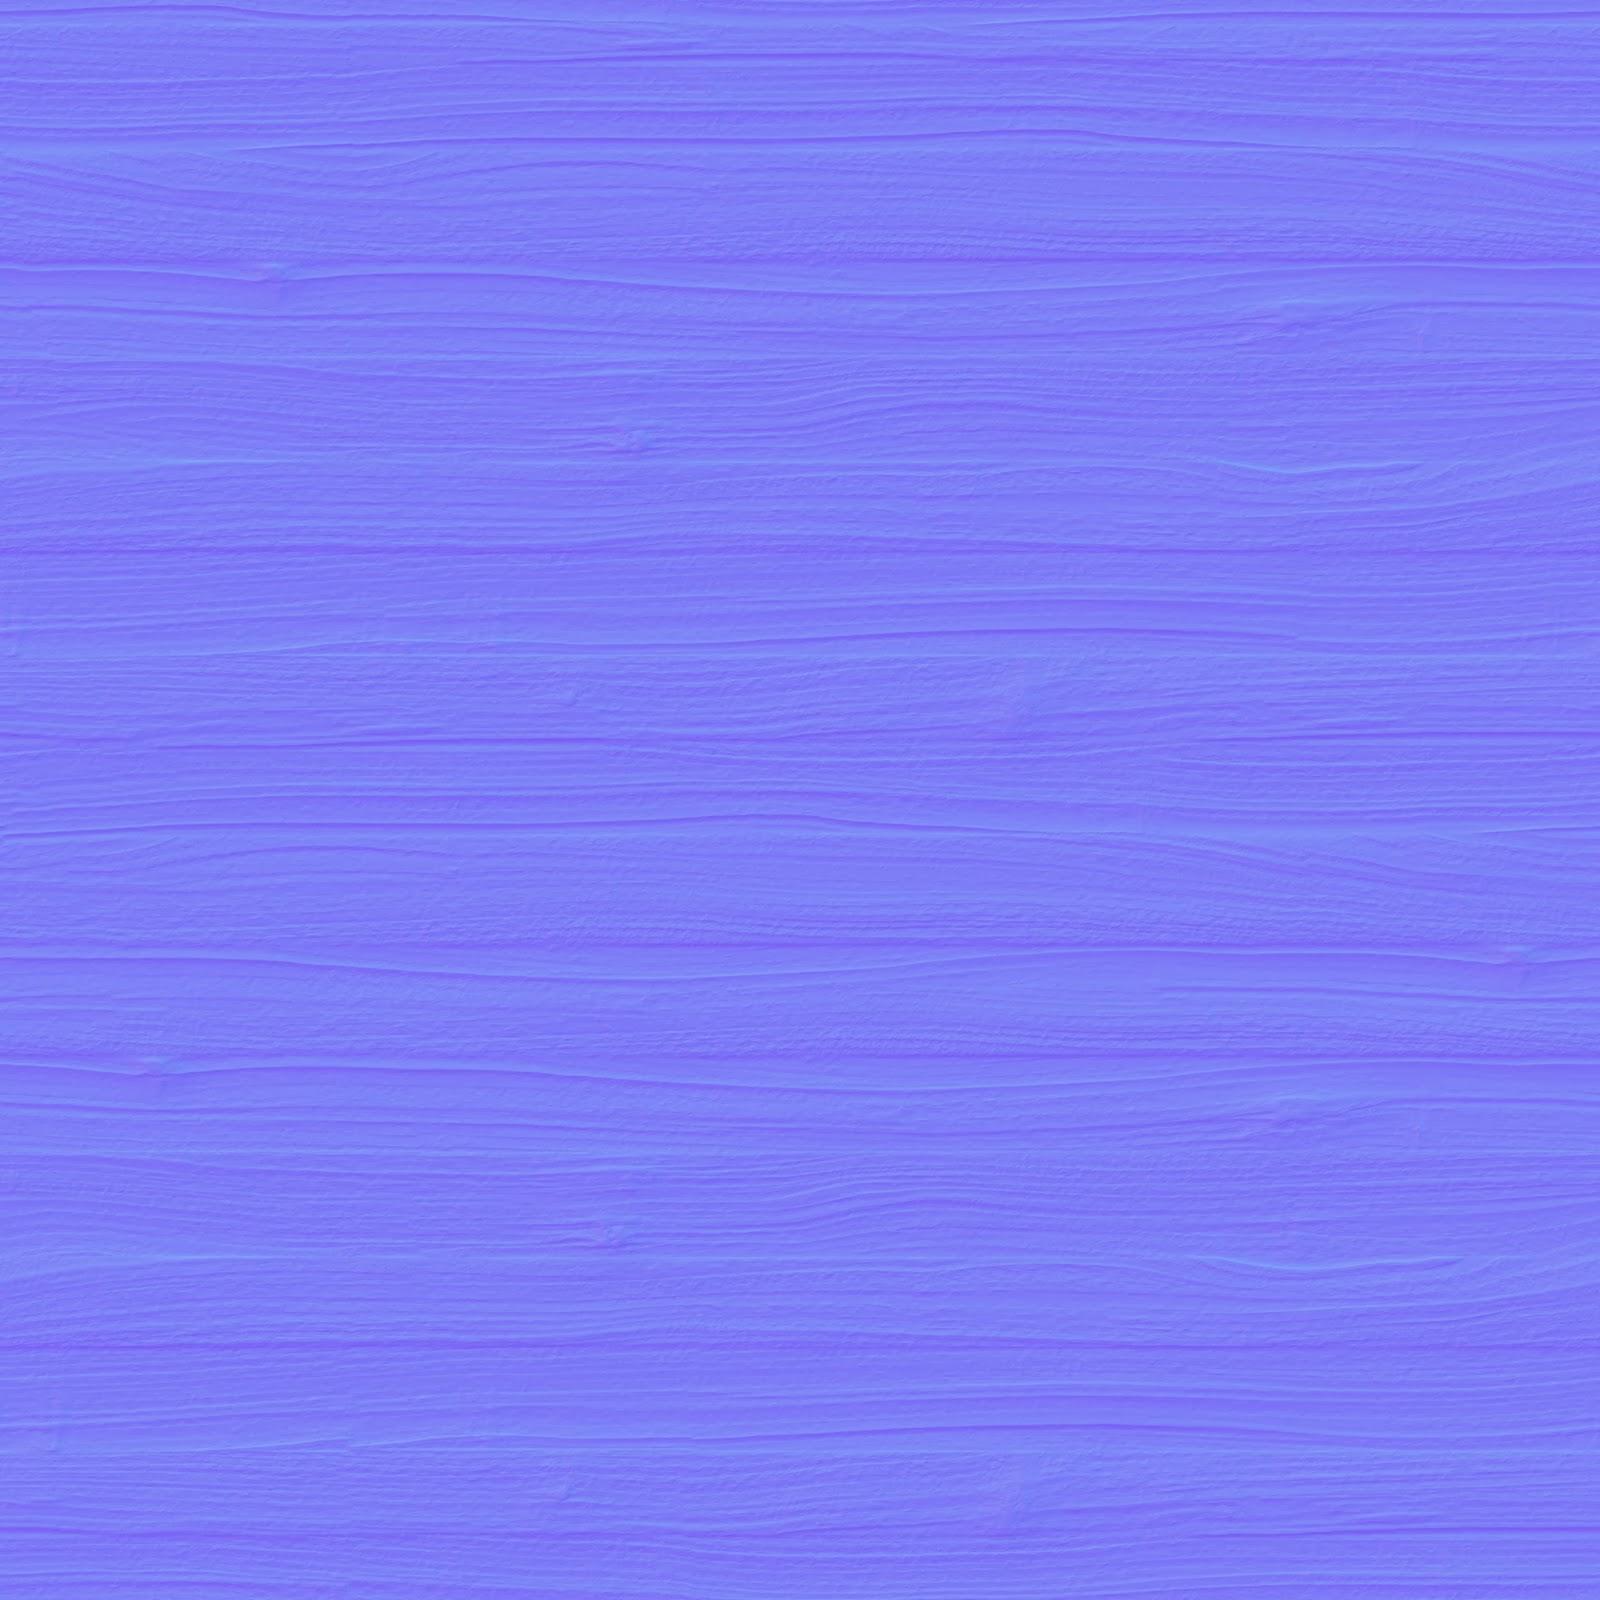 Seamless Light Walnut Texture  Maps  Texturise Free